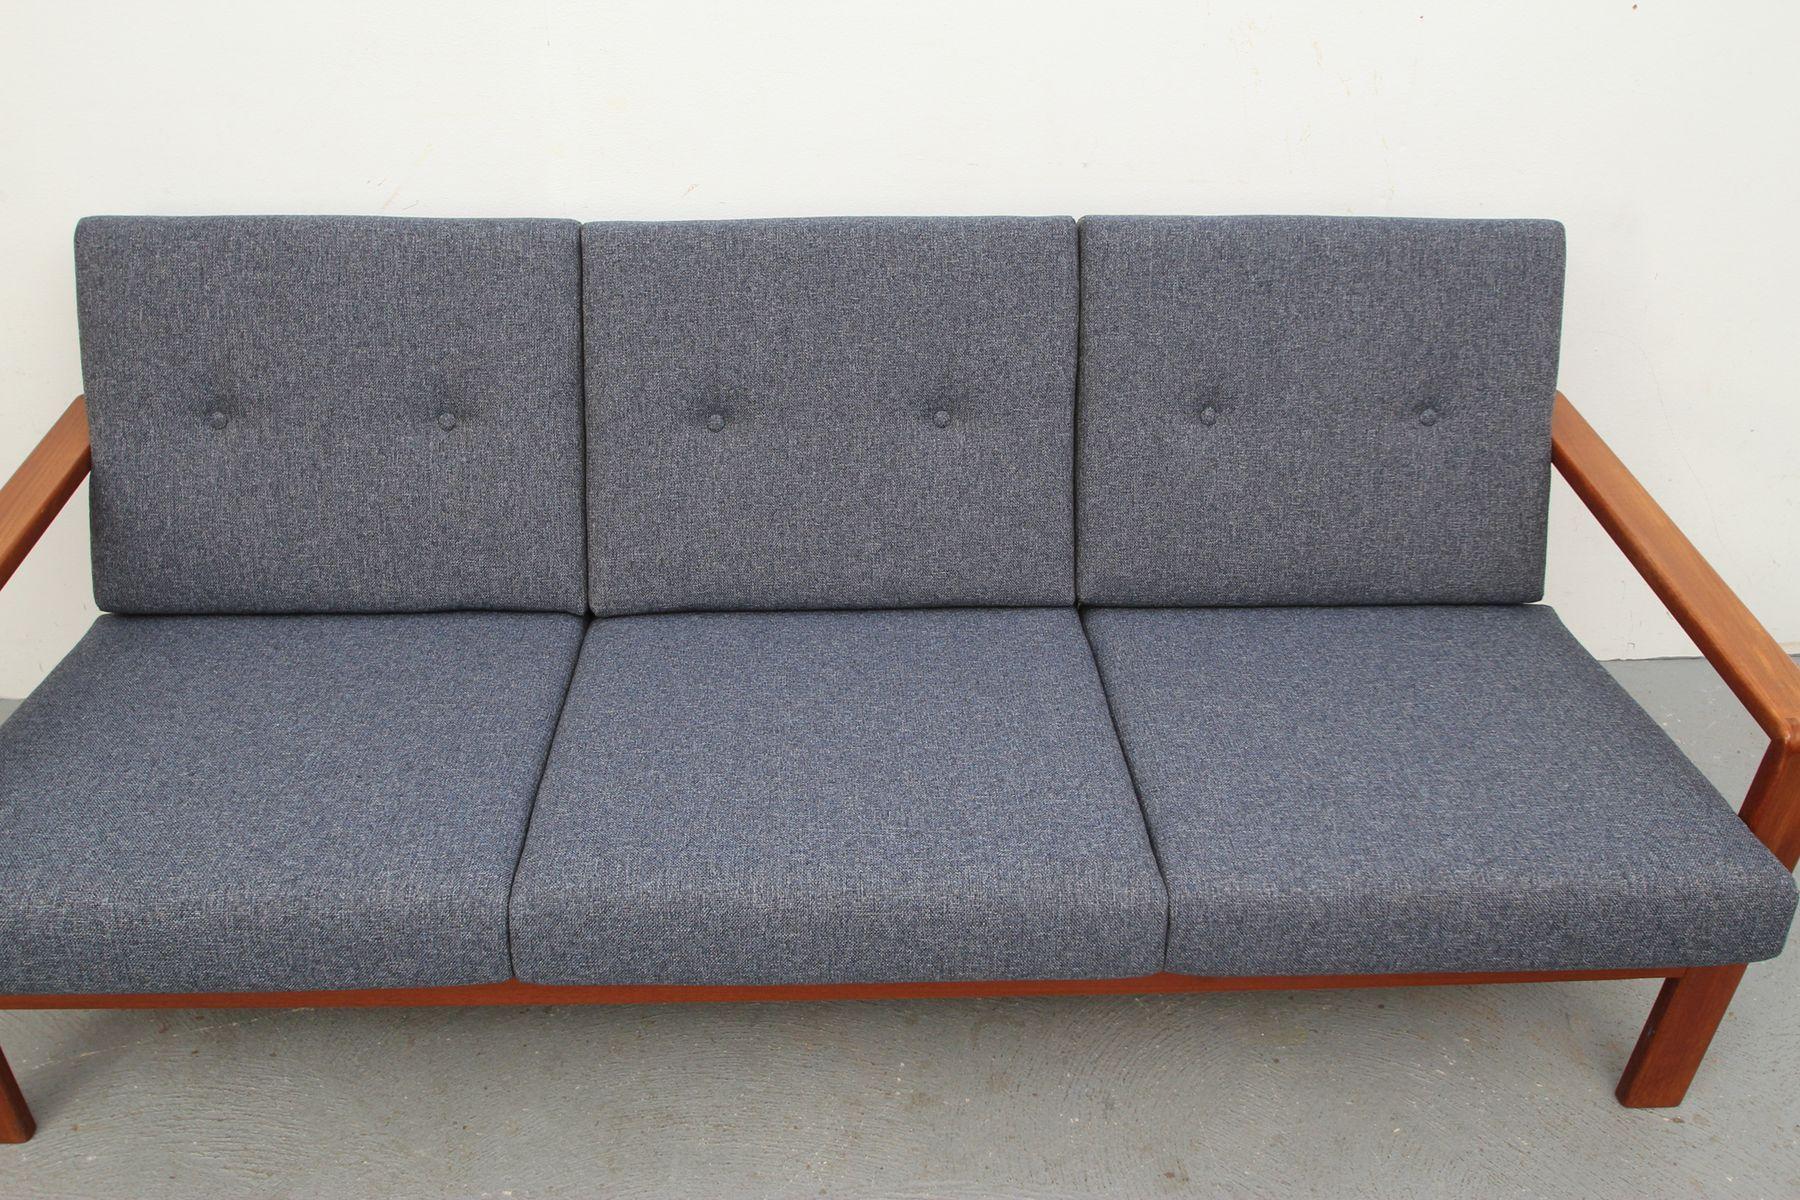 Full Size of Sofa Hersteller 20 Dnische Schn Walter Knoll L Form Led Relaxfunktion Luxus Schillig Hay Mags Grünes U Xxl Halbrundes Cassina Sofa Sofa Hersteller